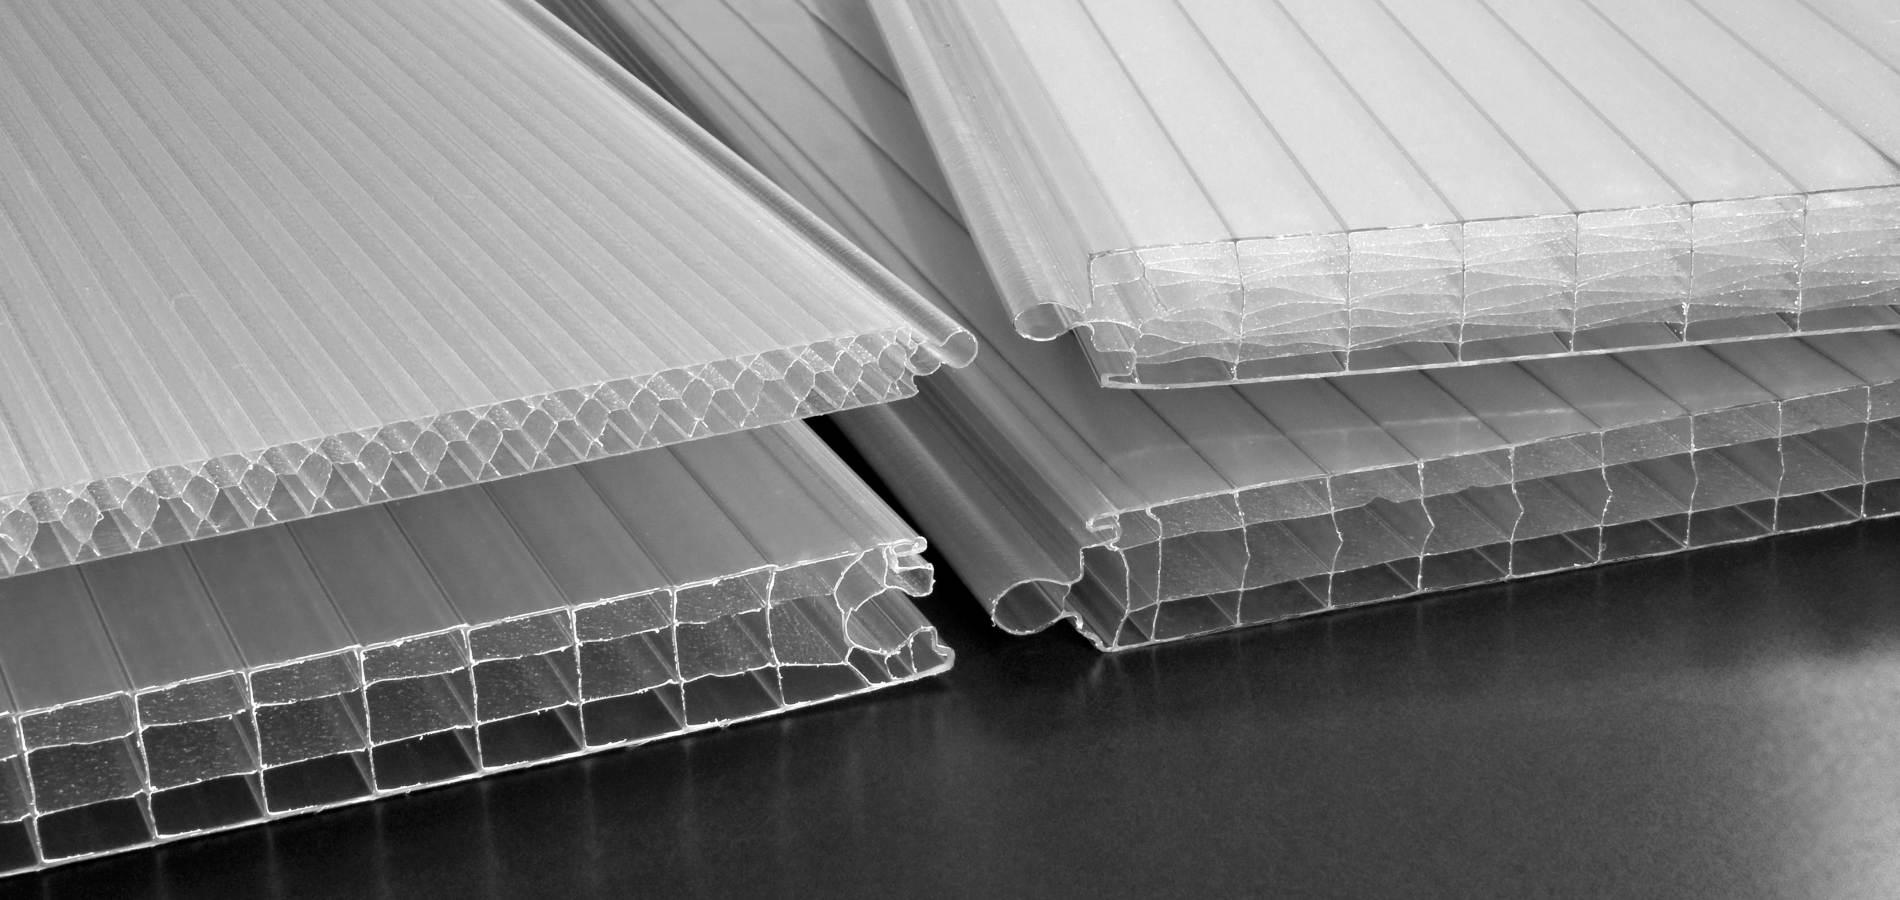 插接陽光板,30mm插接陽光板,40mm插接陽光板,50mm插接陽光板,60mm插接陽光板